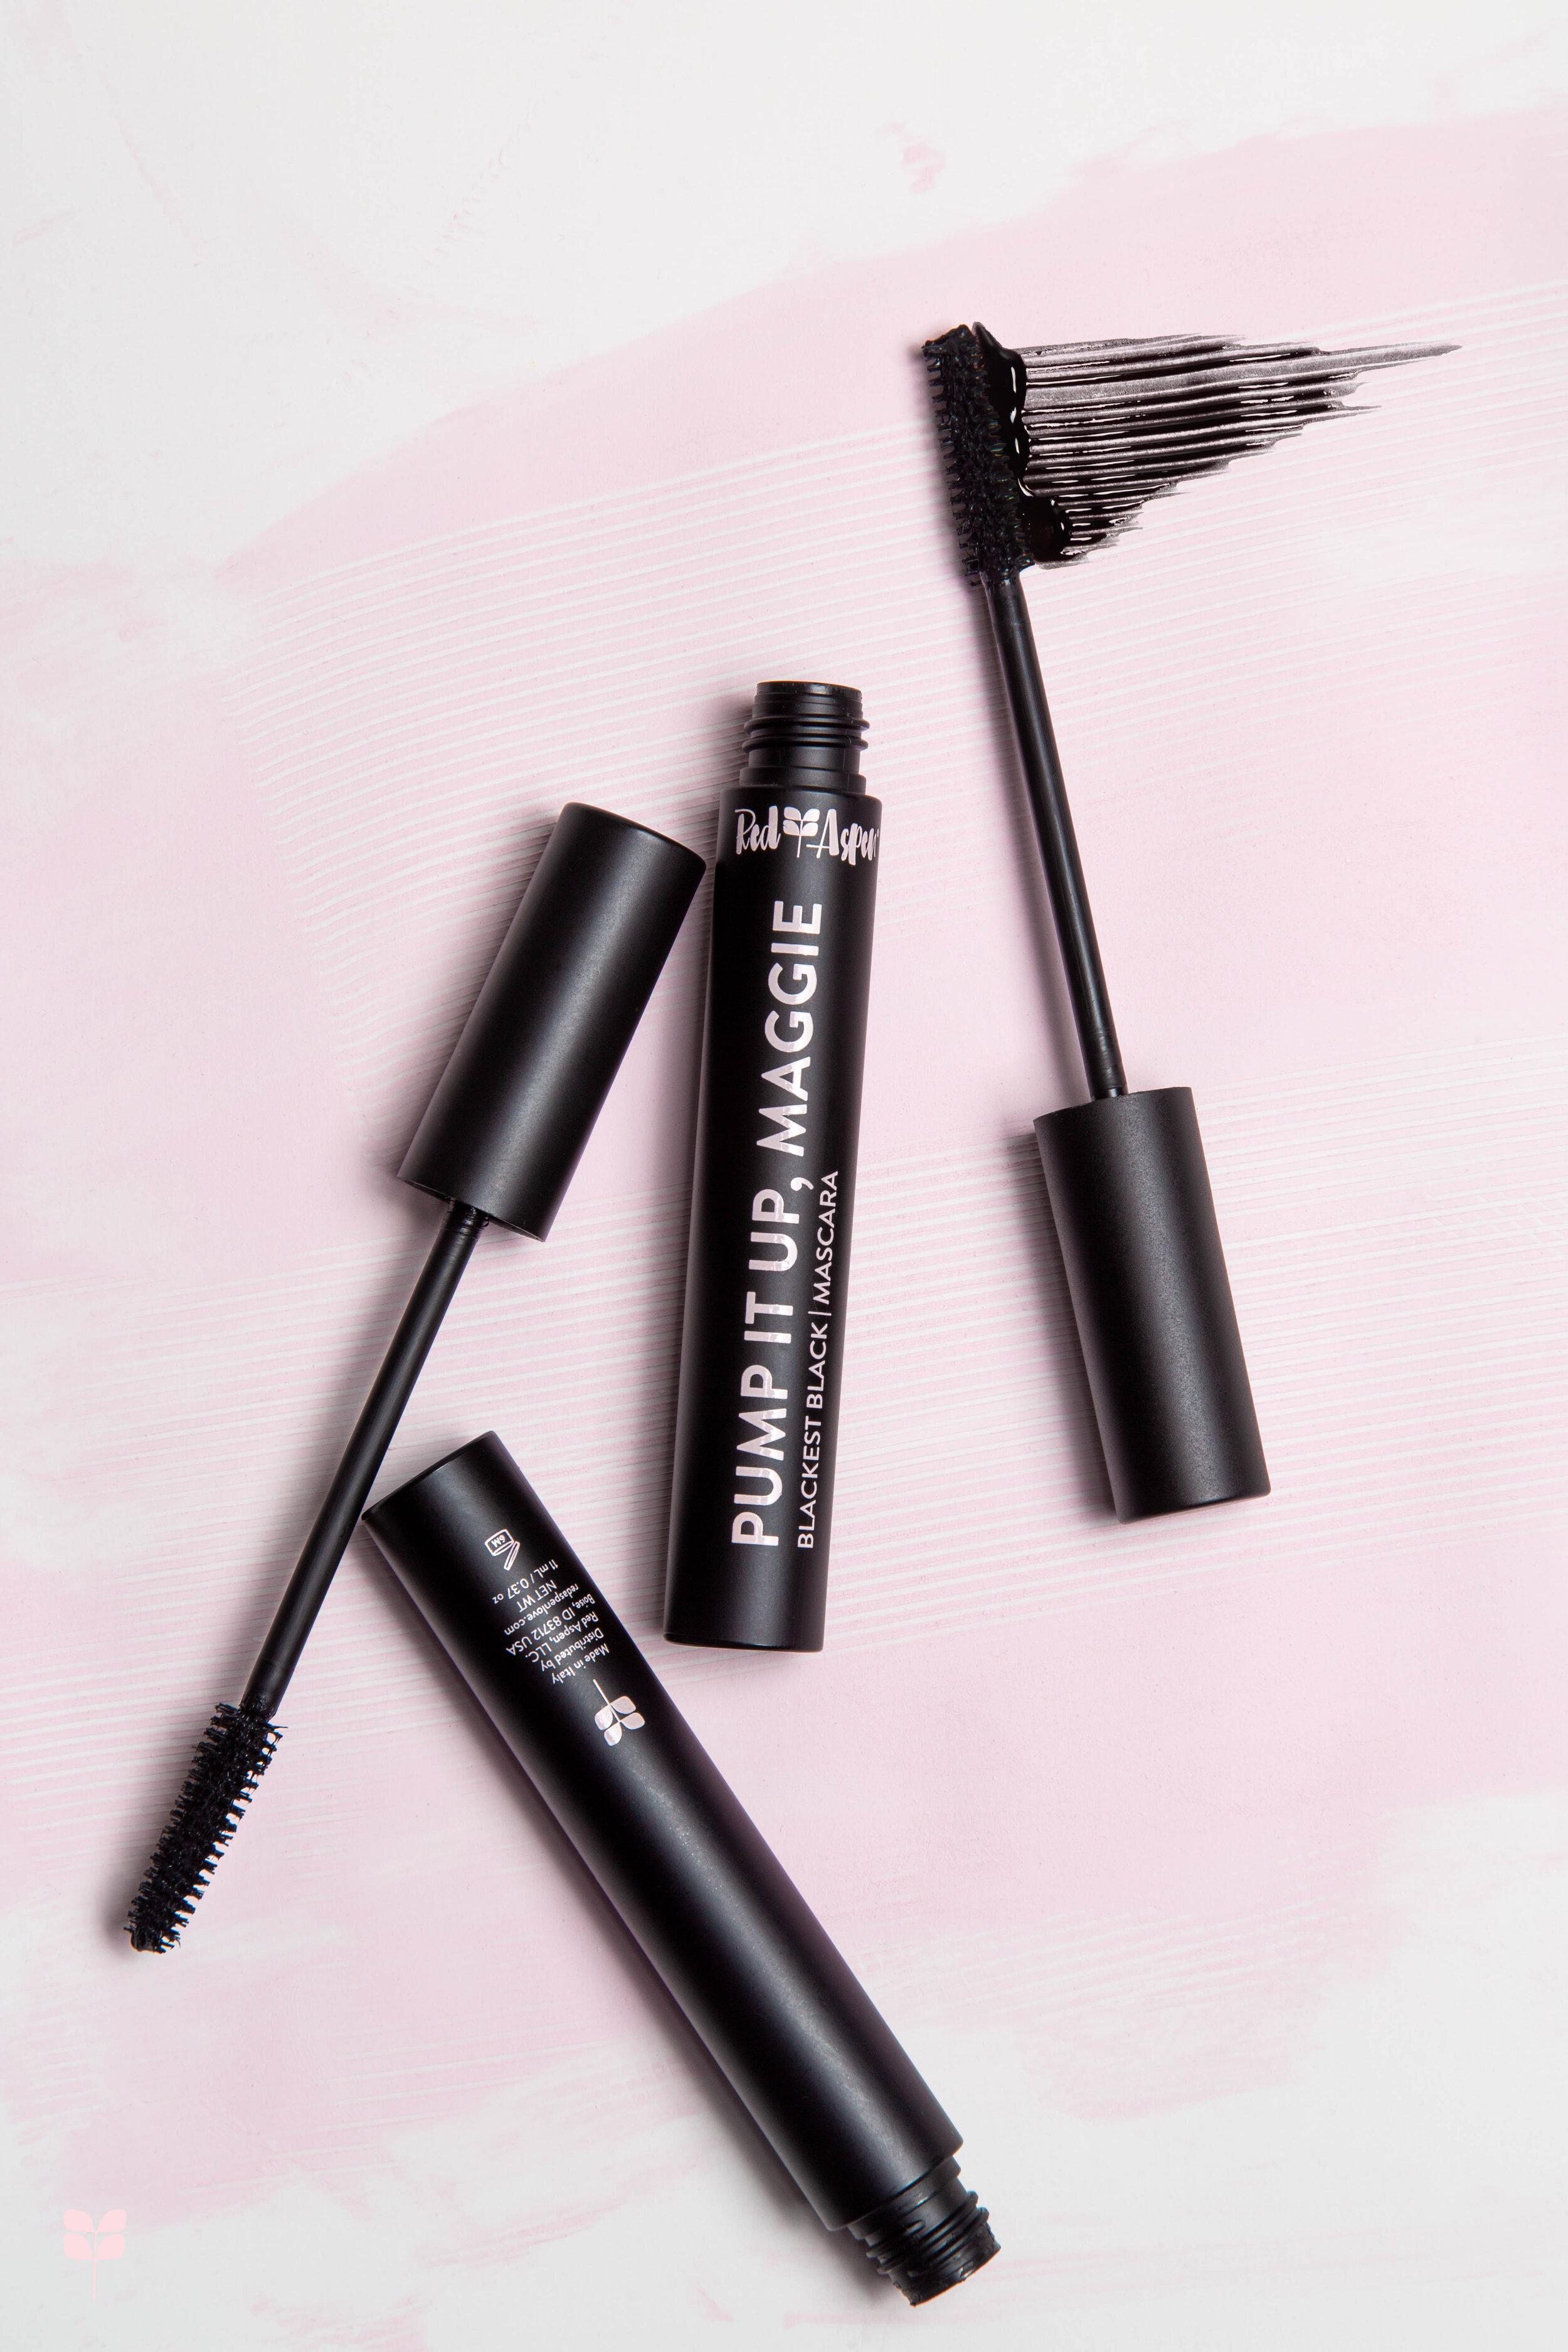 Watermark - Pump it Up, Maggie Product Styled.jpg